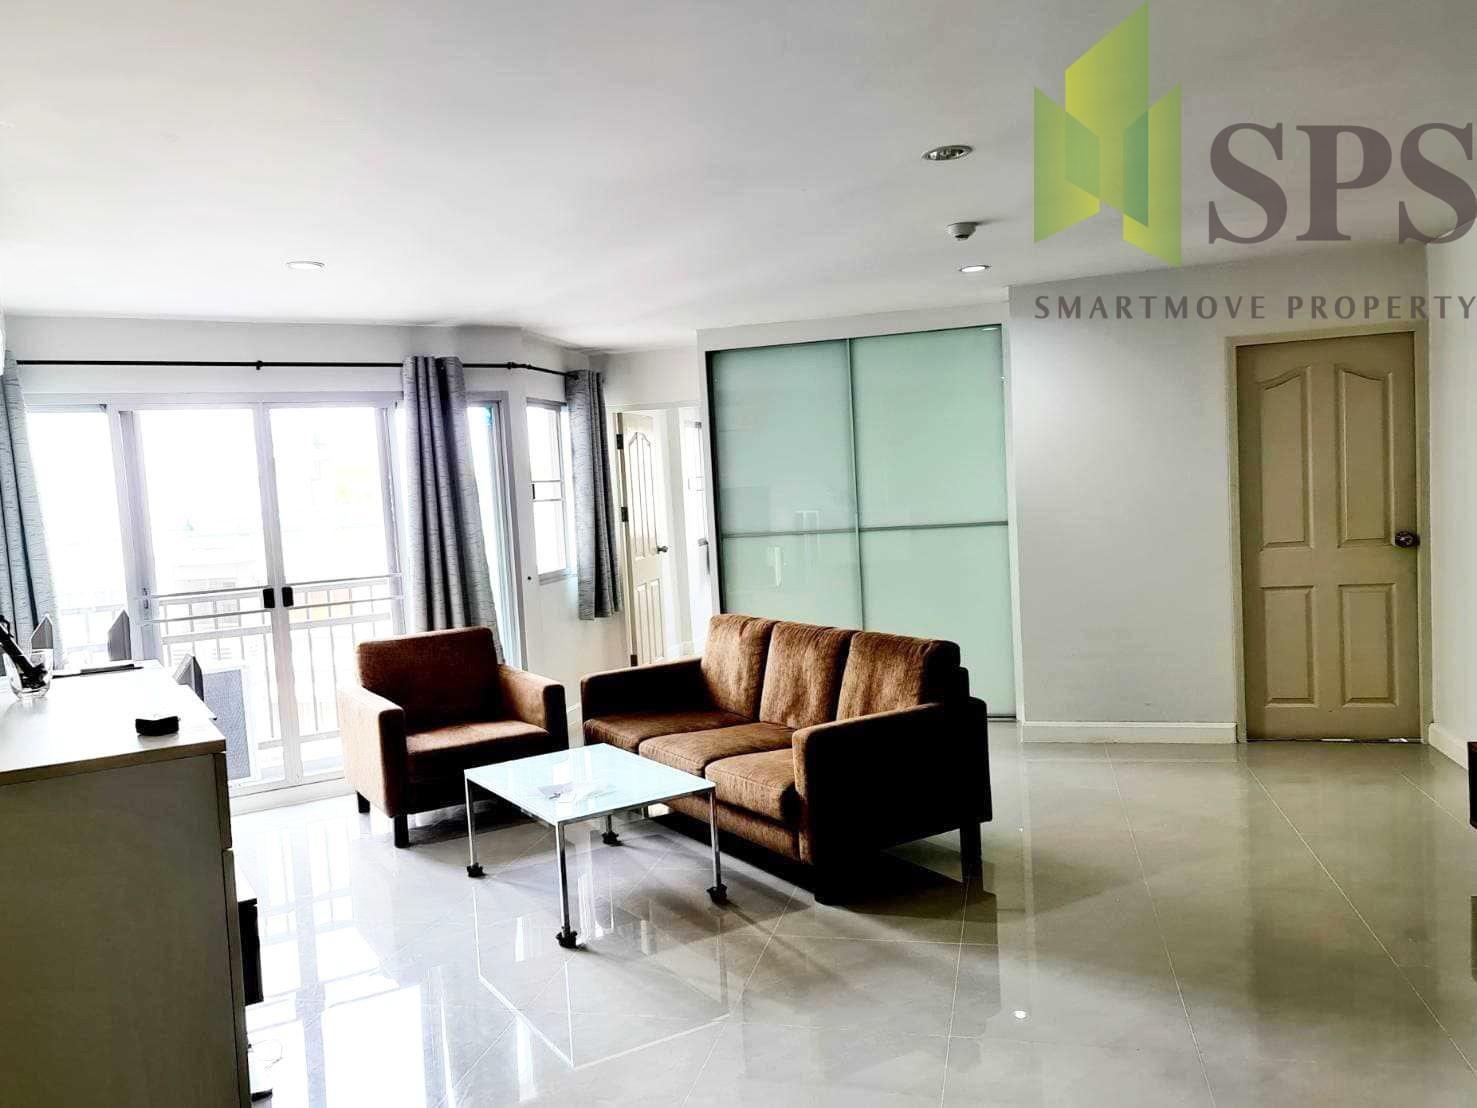 Belle Park Residence (เบล พาร์ค เรสซิเดนท์) Sathu Pradit 19 (SPS-GC689)